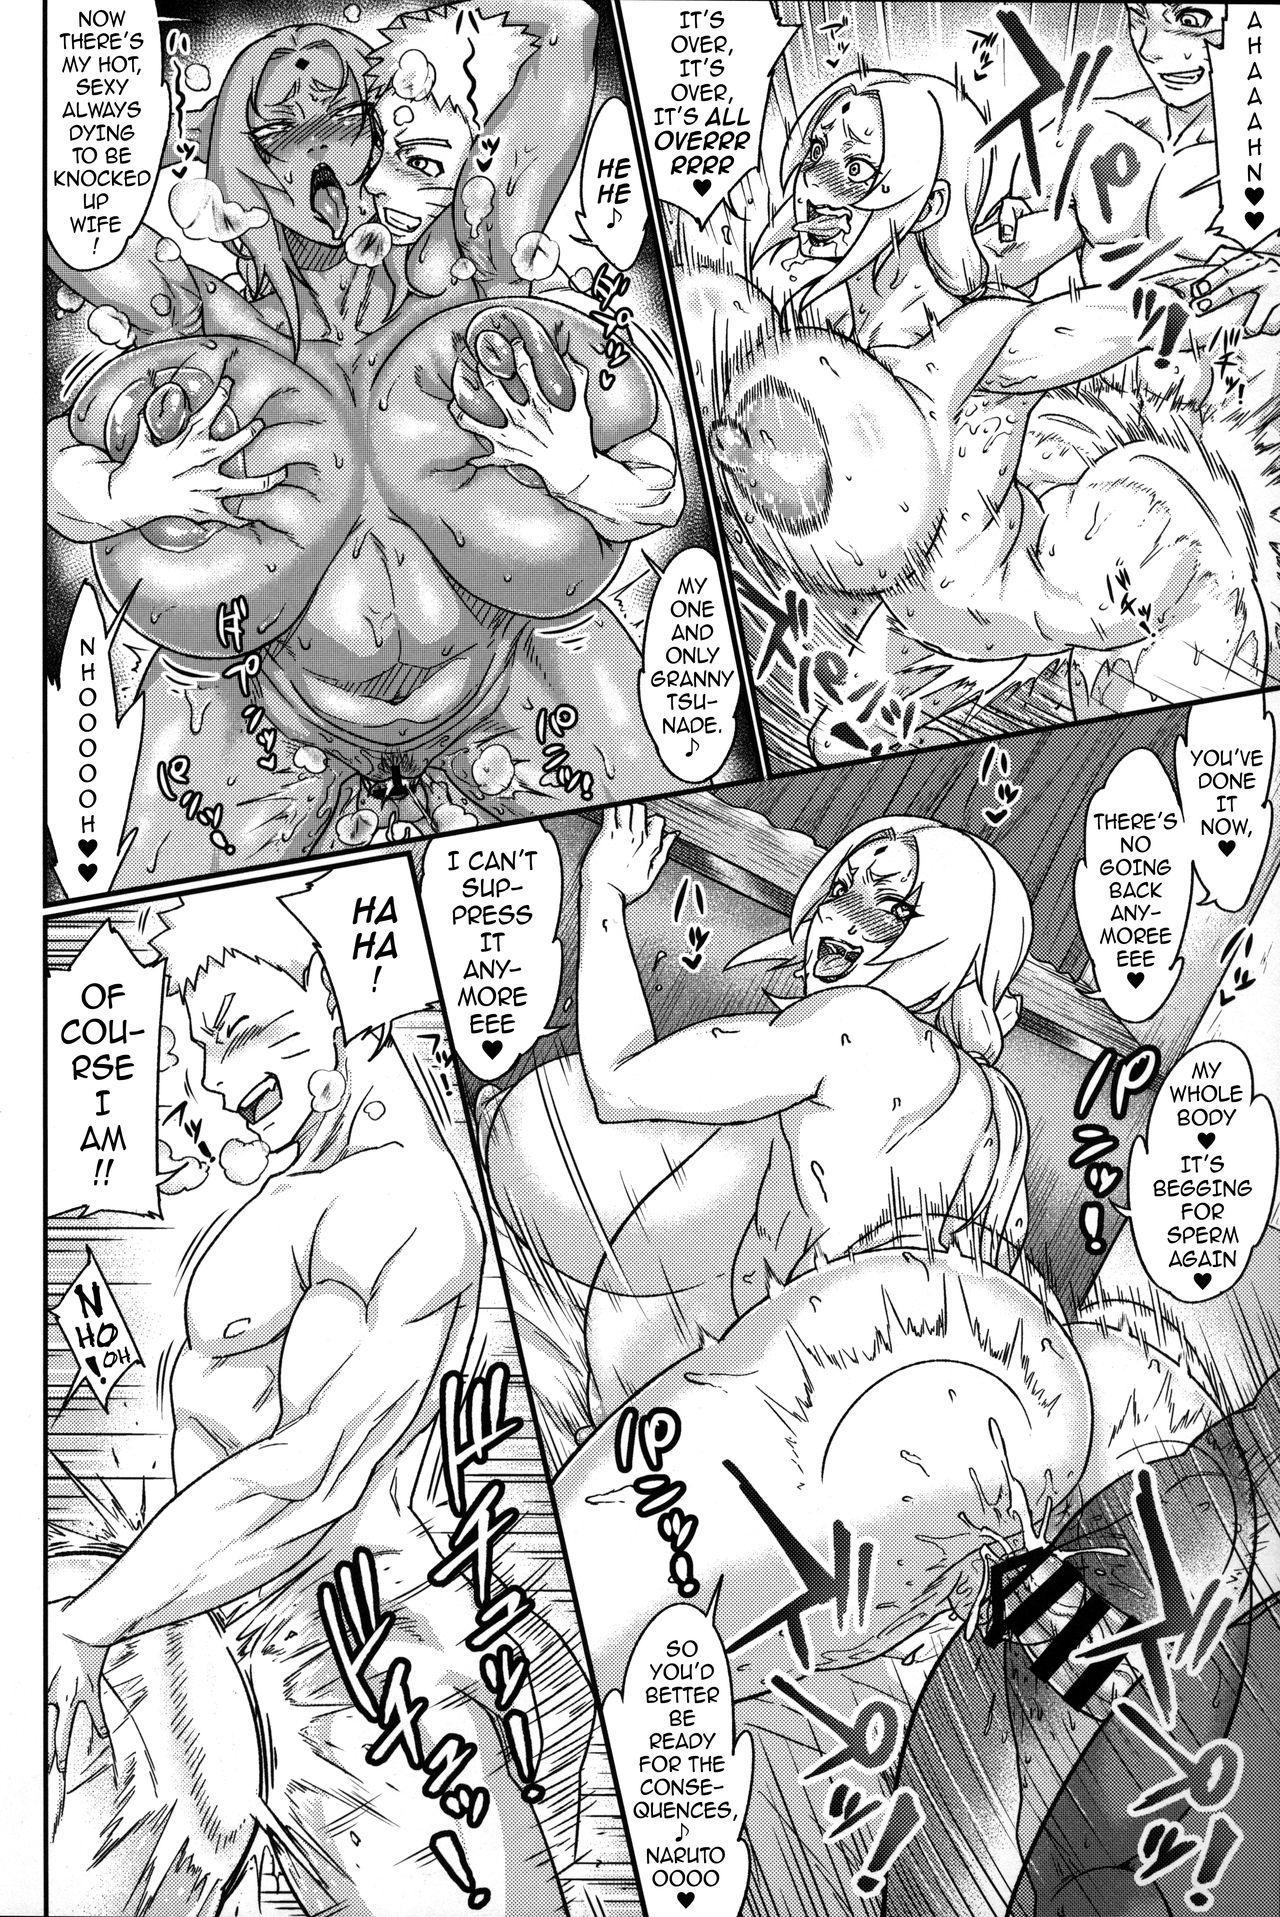 Jukumitsuki Intouden 3 Jou | Debauchery of a Mature Honeypot Princess Ch 3 - Part 1 17